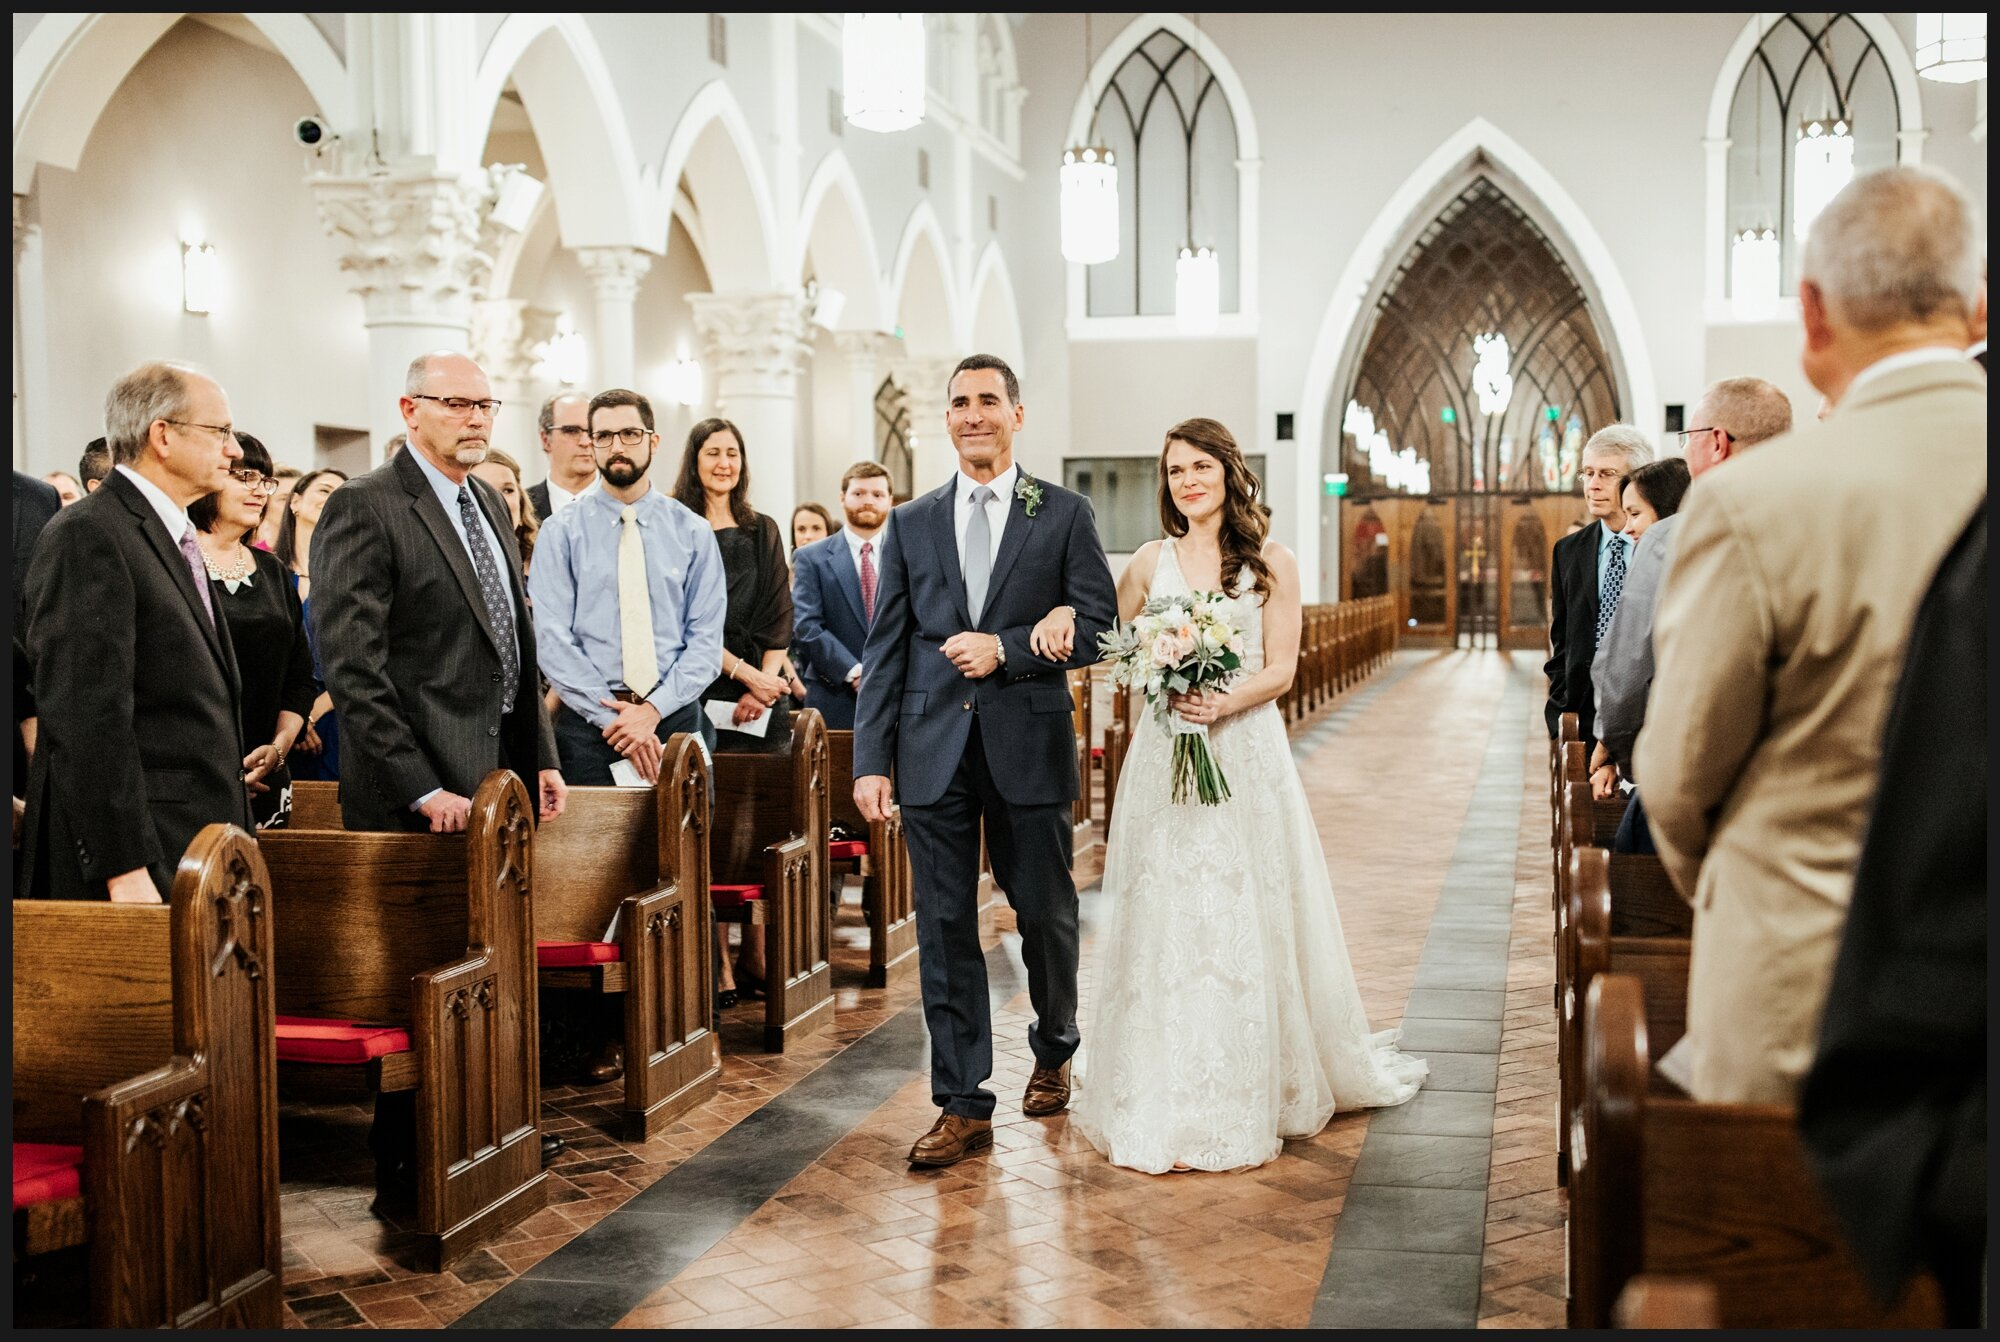 Orlando-Wedding-Photographer-destination-wedding-photographer-florida-wedding-photographer-hawaii-wedding-photographer_0678.jpg